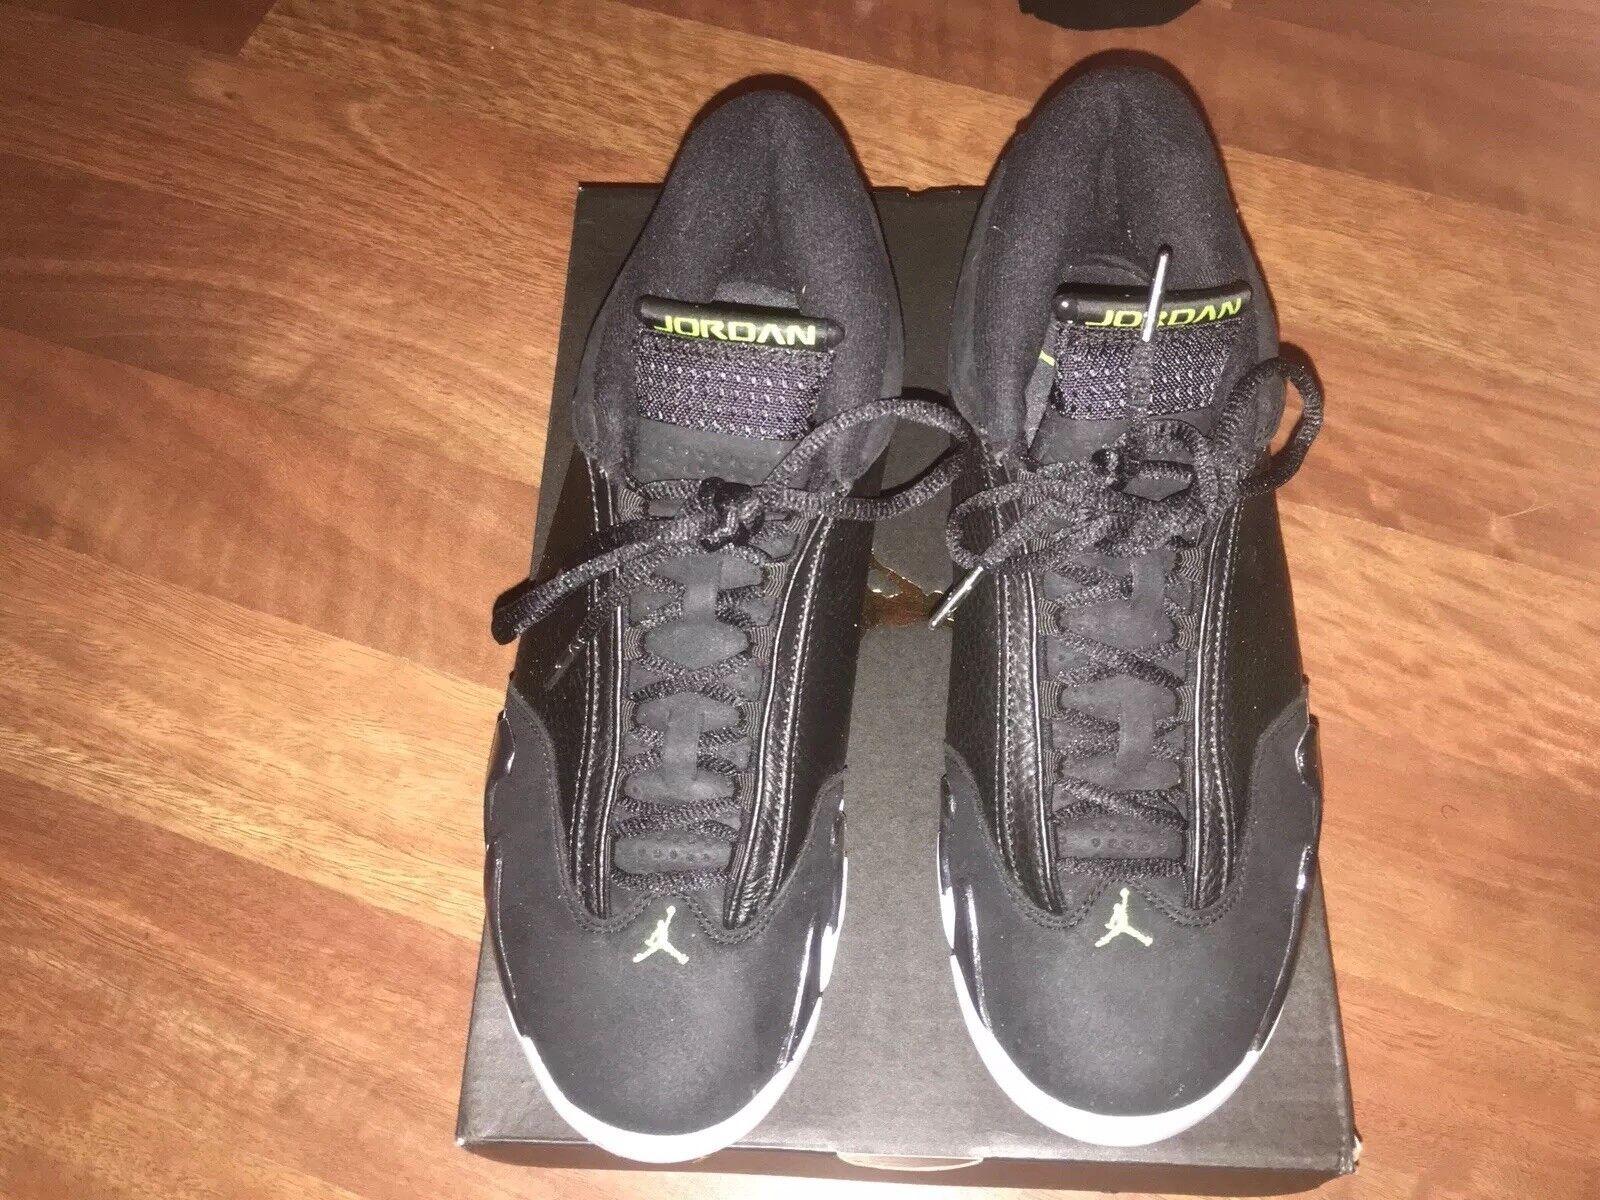 promo code ff8c2 9b21e Air Jordan 14 XIV Retro Size 9.5 9.5 9.5 Indiglo Black White Vivid Green  487471-005 e4f150